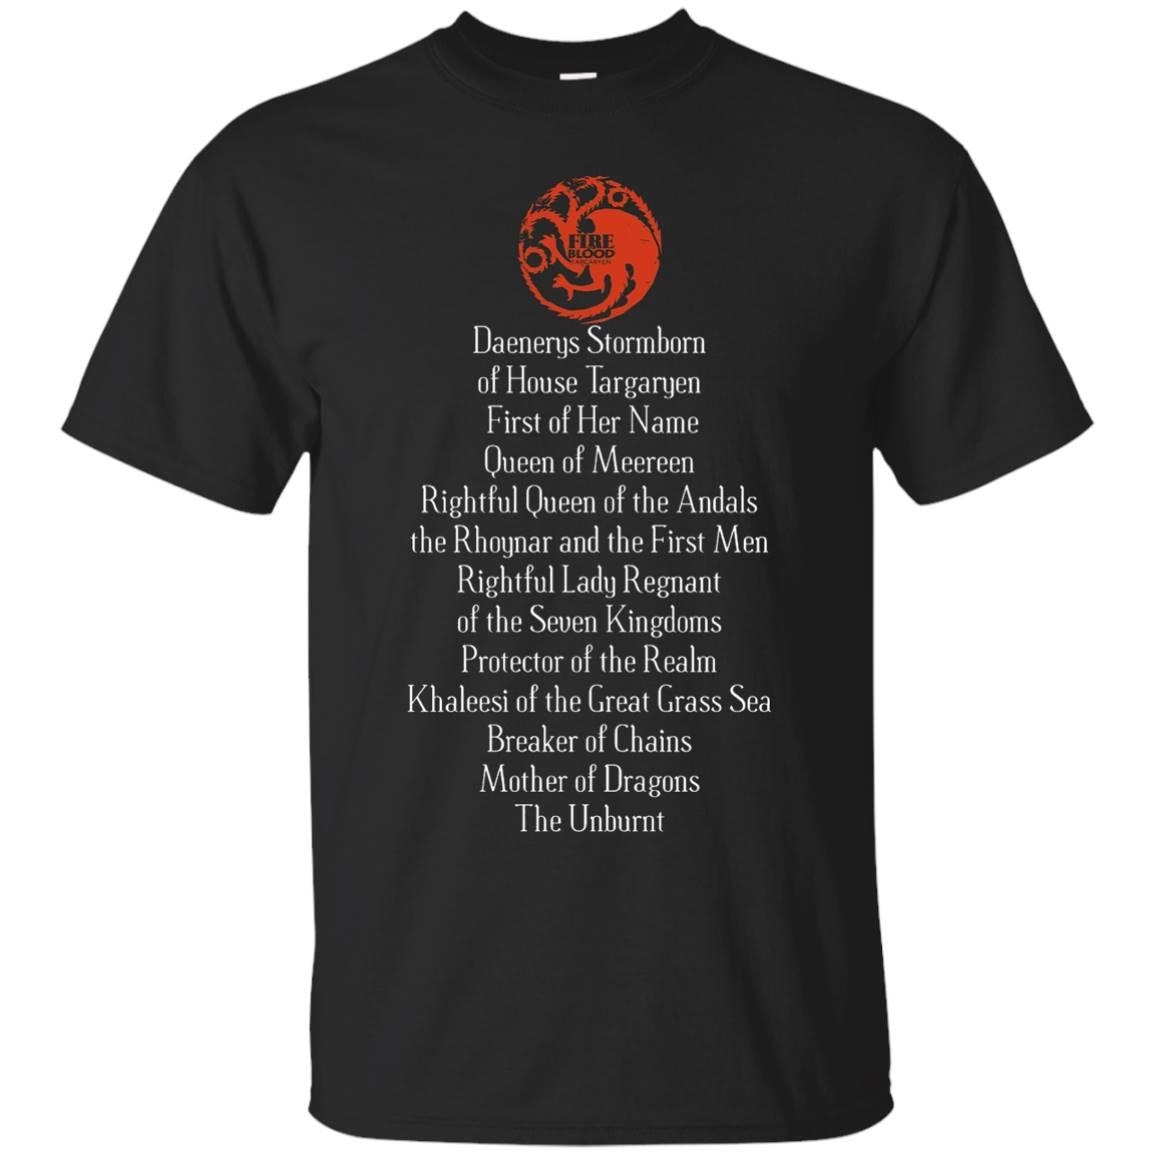 Daenerys Targaryen Full Name